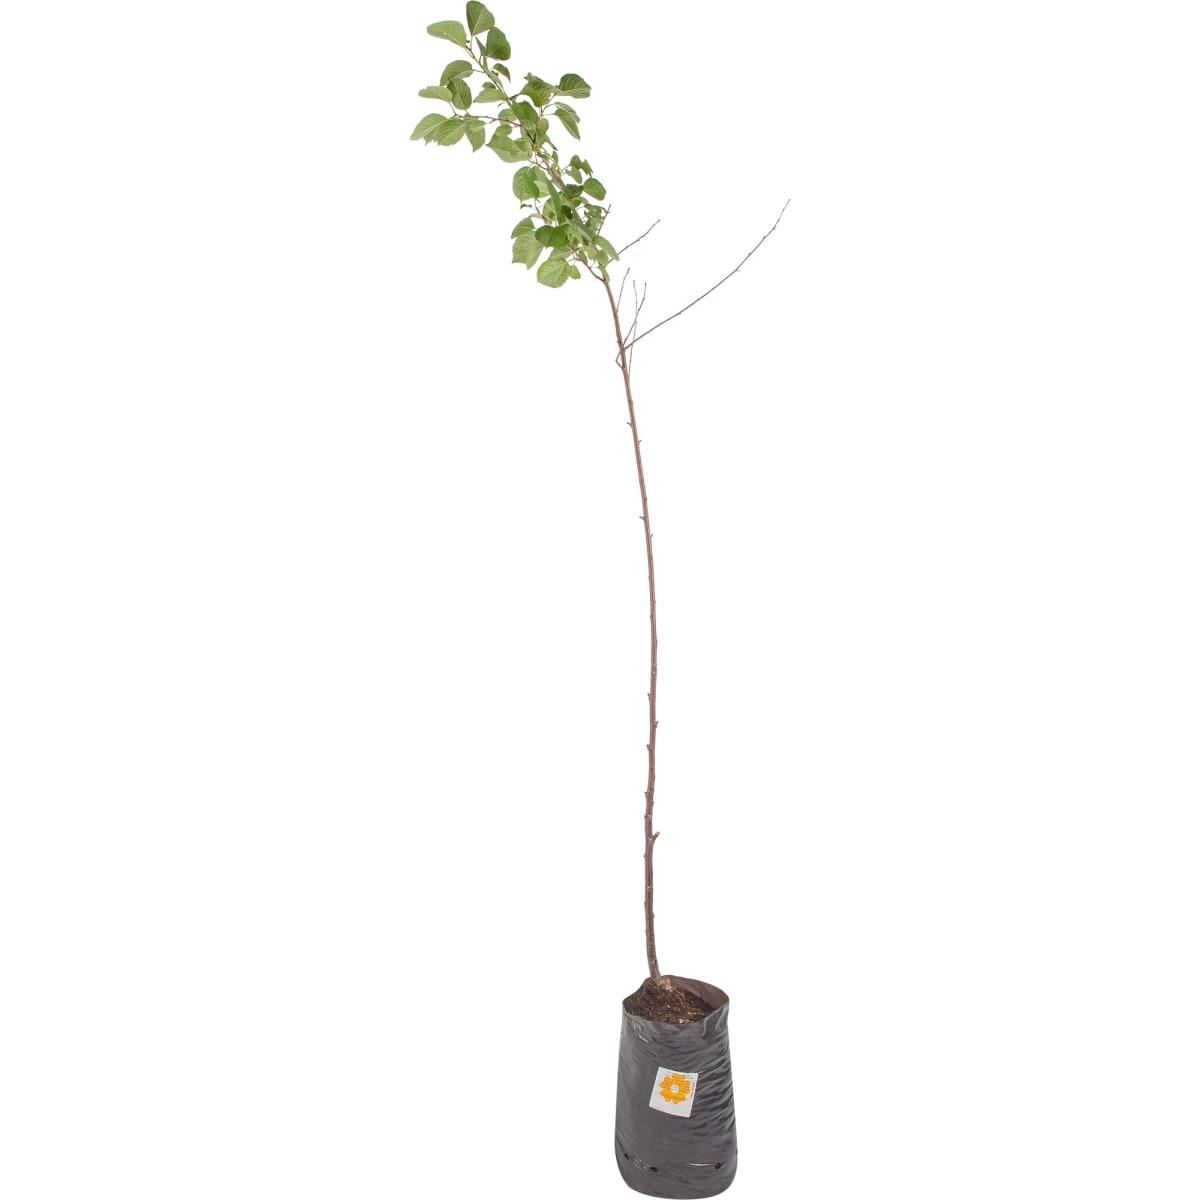 Вишня «Свердловчанка» 3-5 л высота 100 см